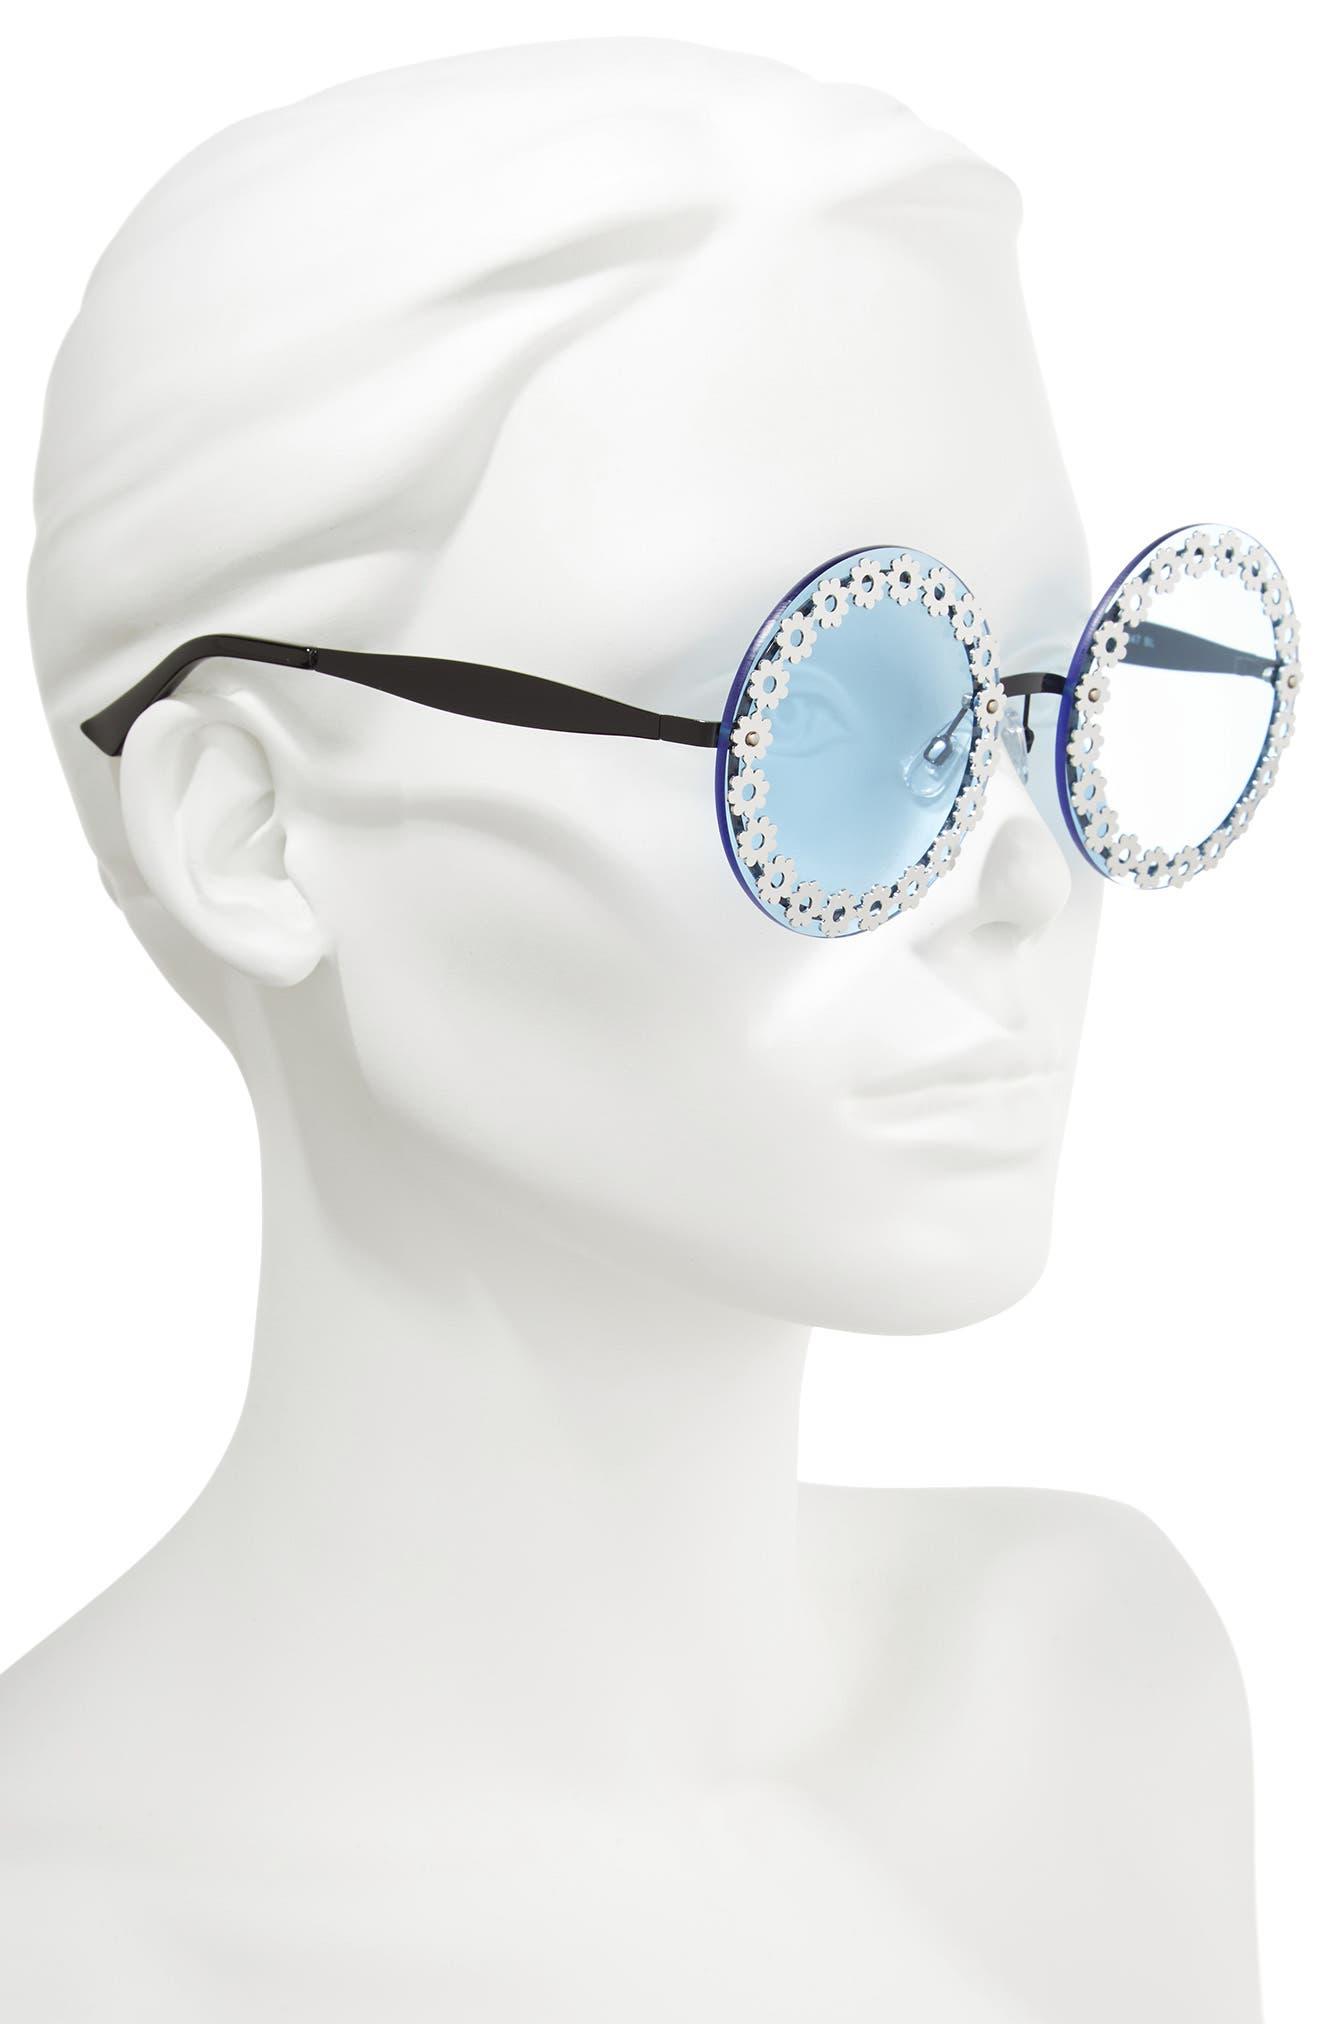 60mm Round Sunglasses,                             Alternate thumbnail 2, color,                             401